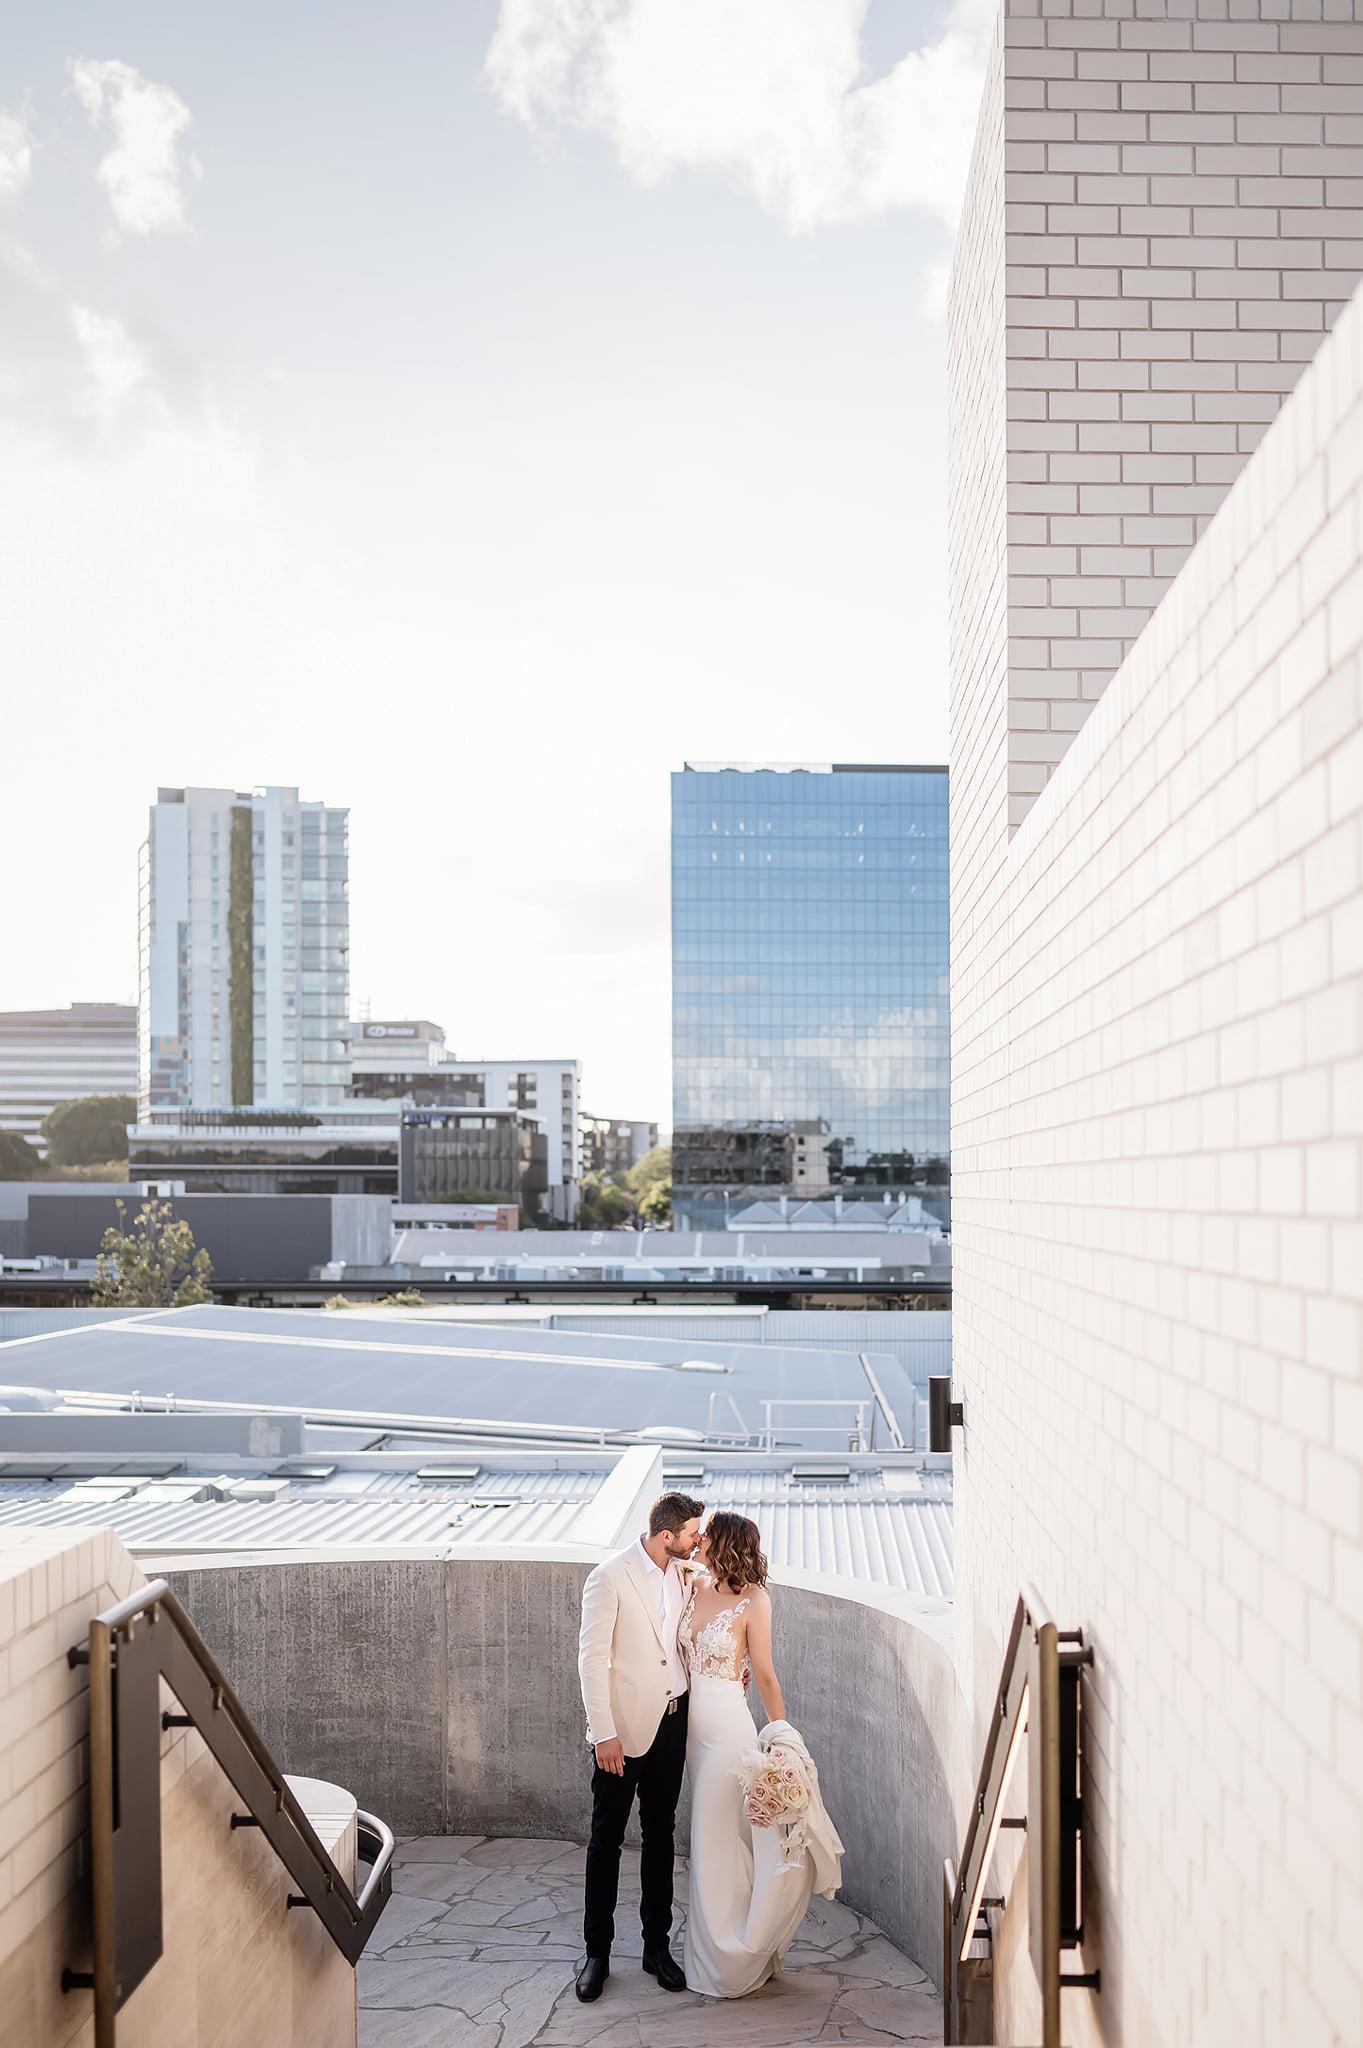 Calile hotel wedding photoshoot